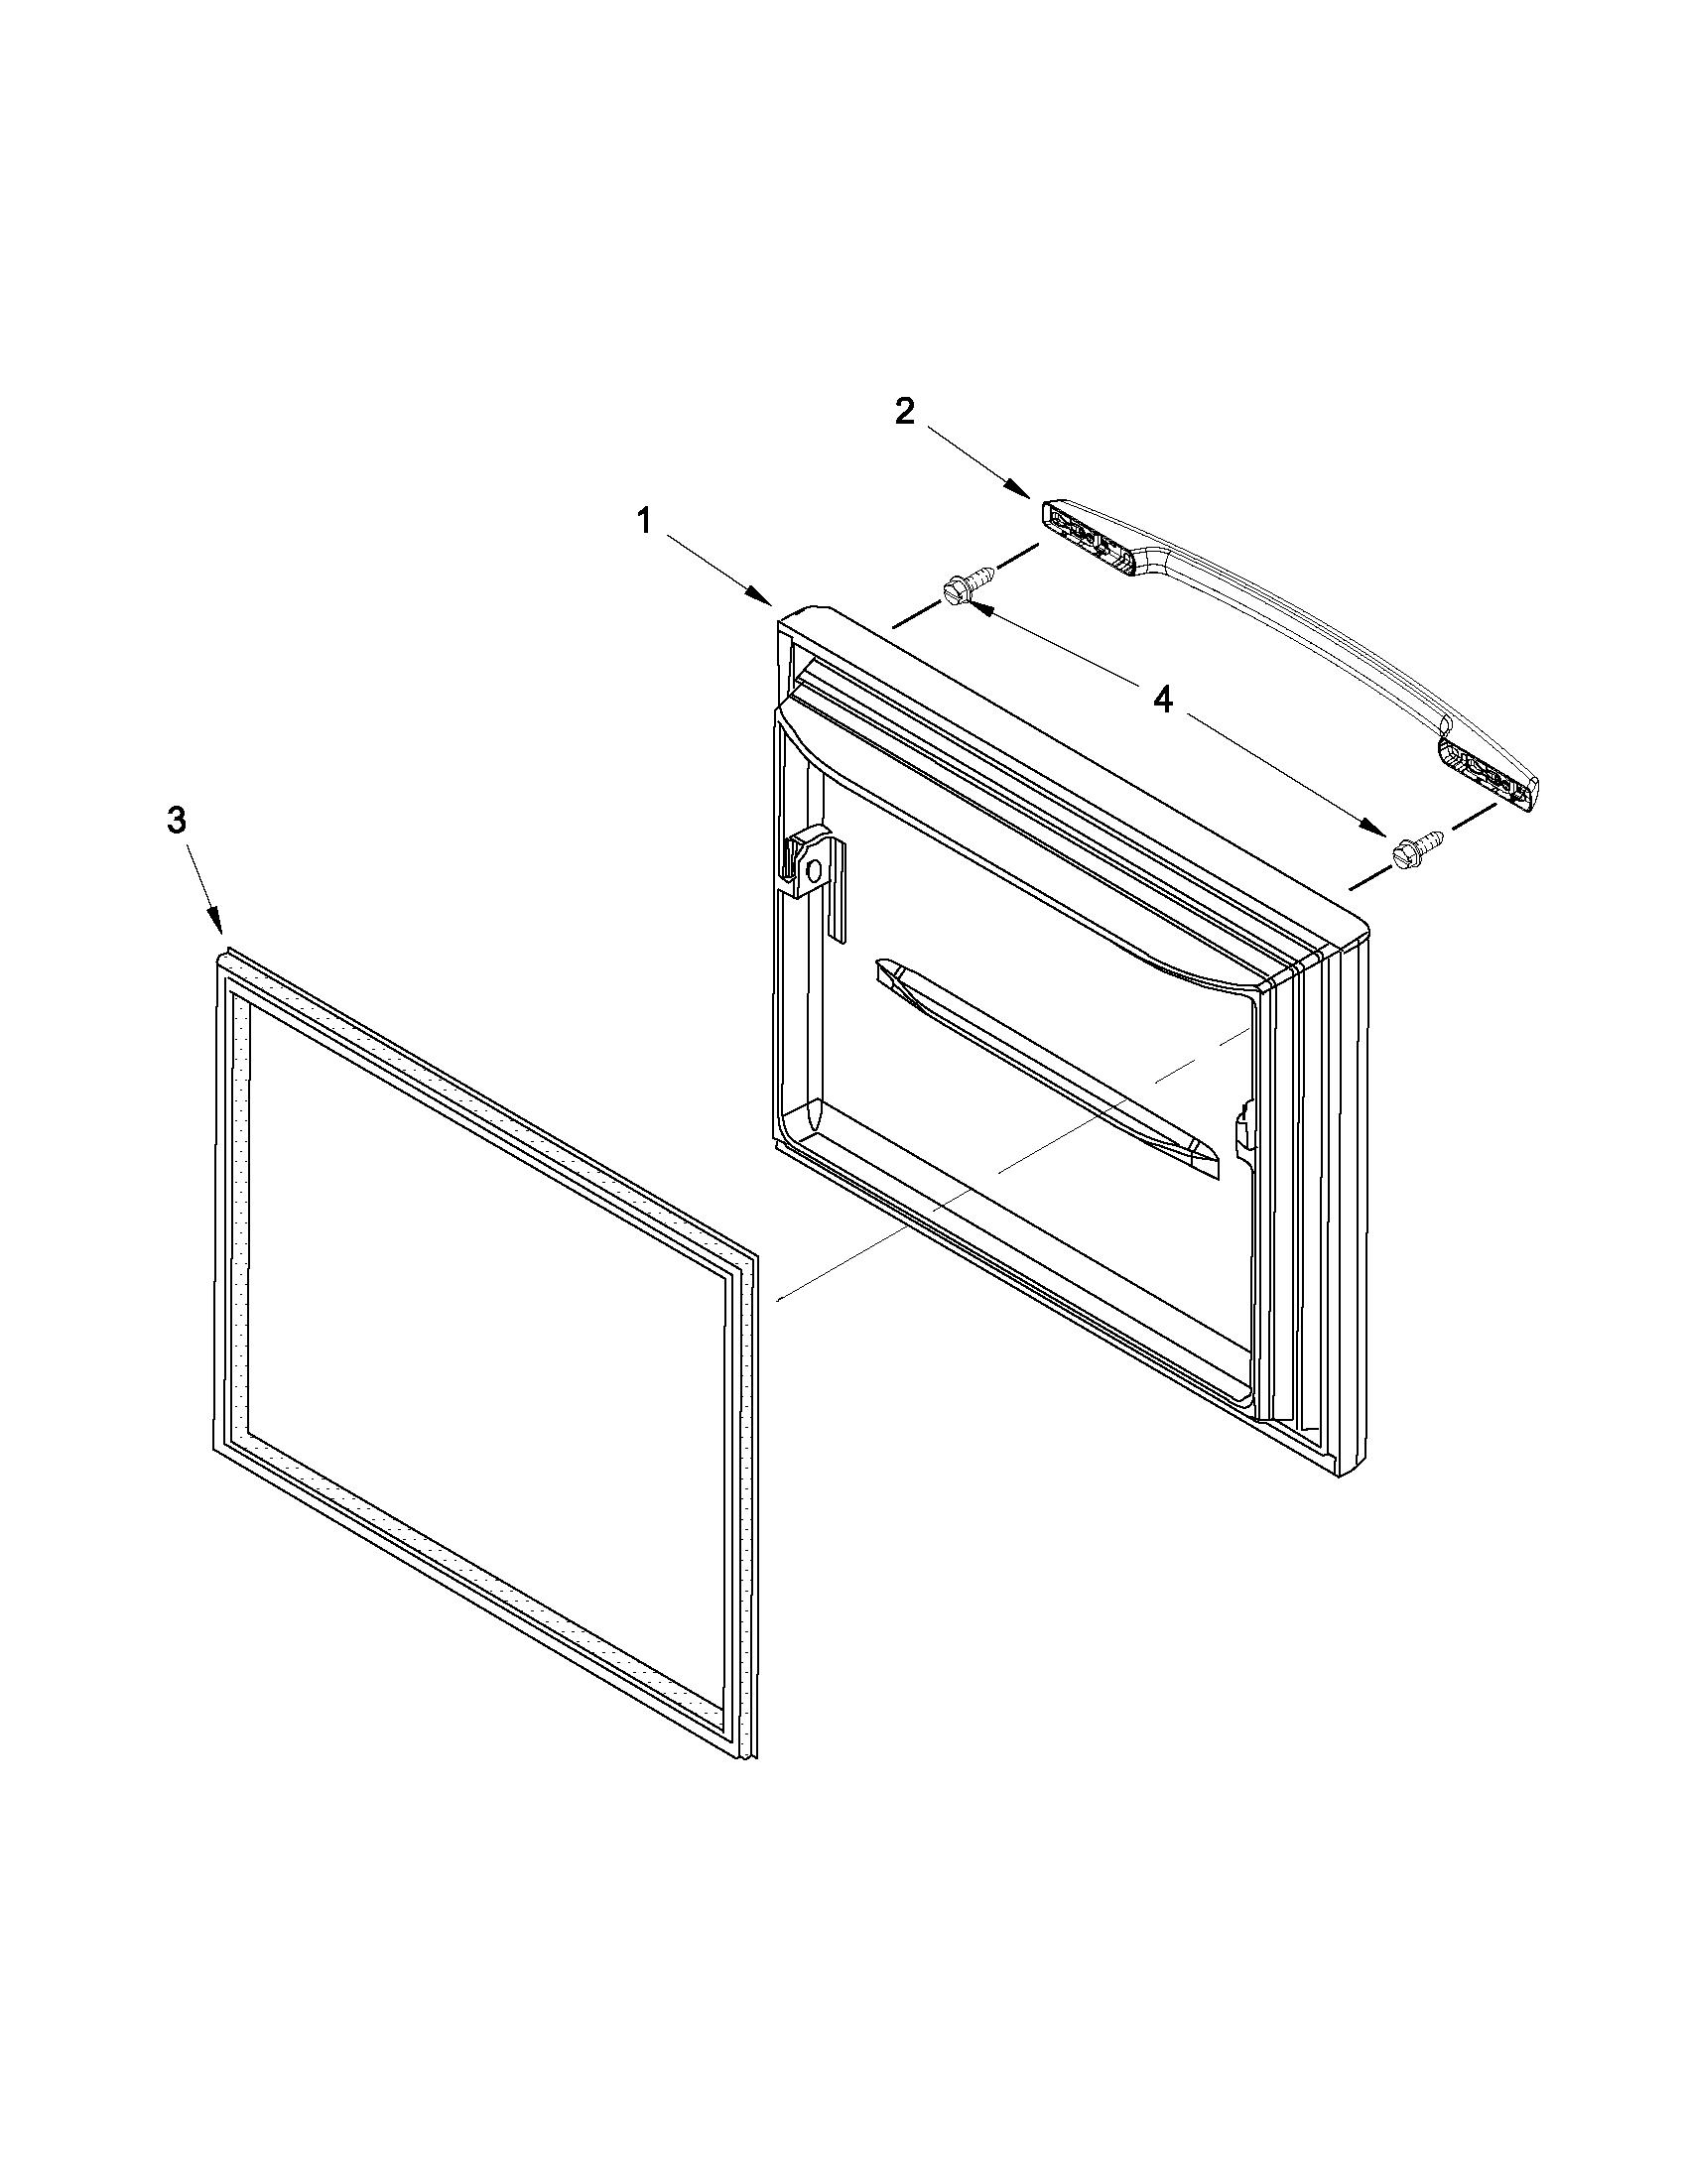 Maytag model MBF1958XEW5 bottom-mount refrigerator genuine